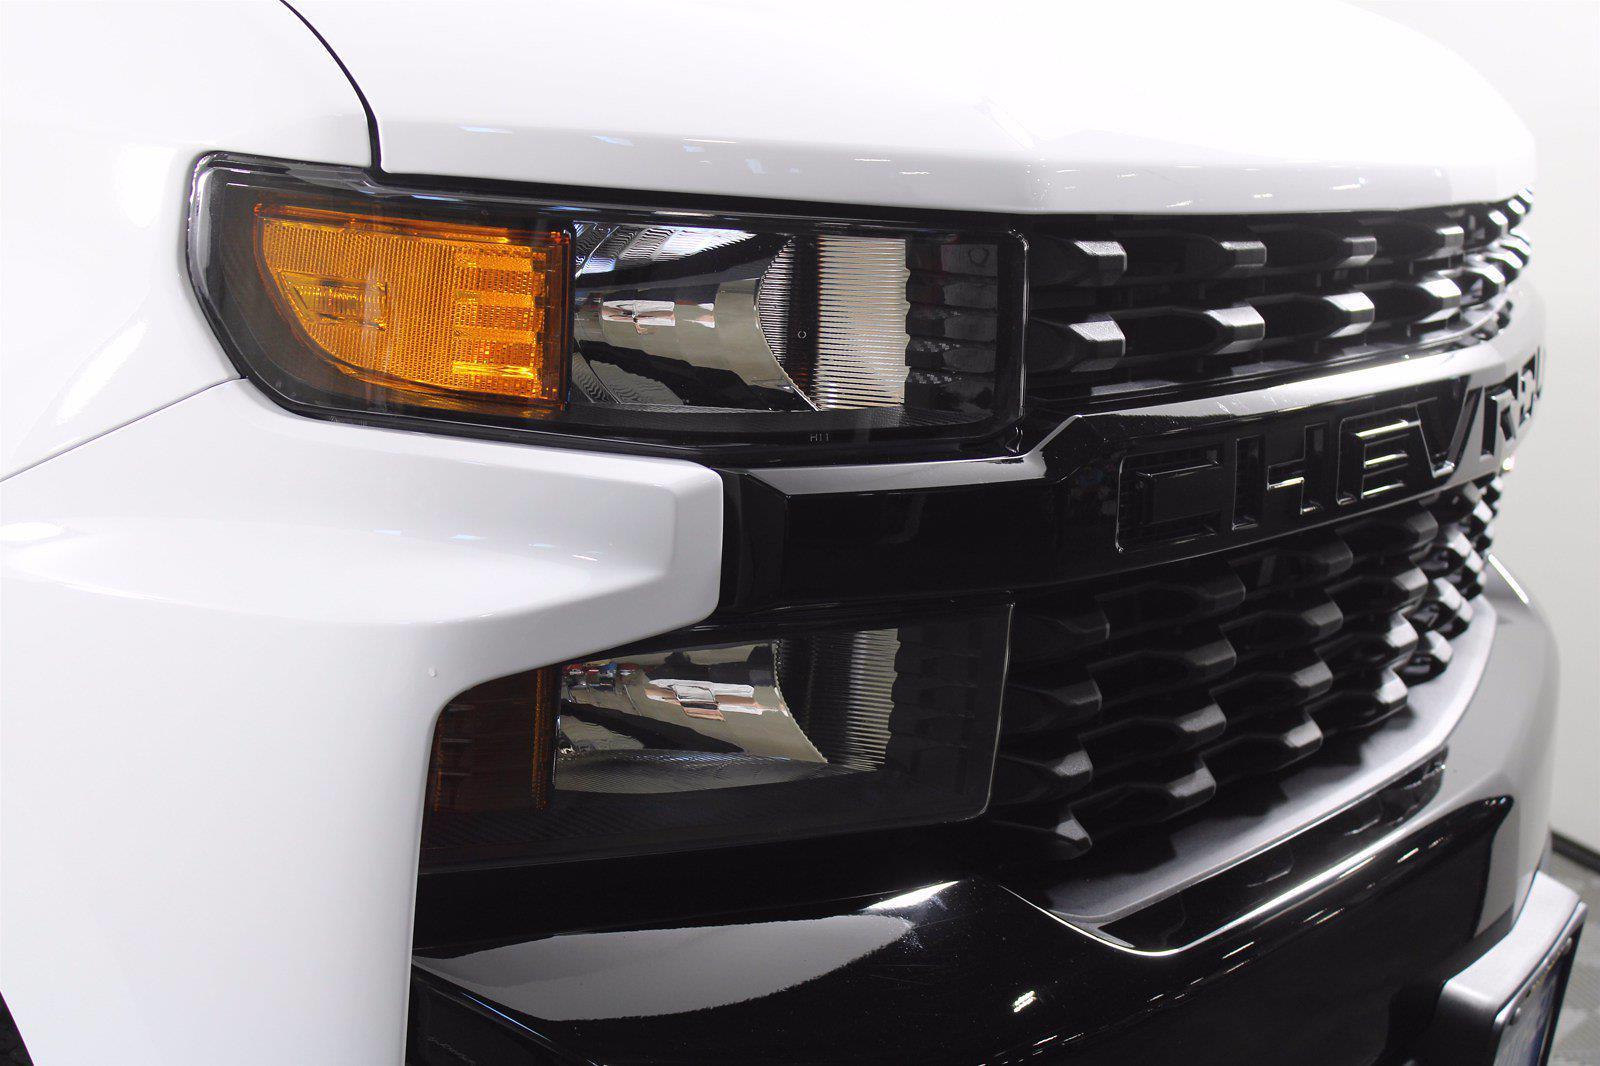 2020 Chevrolet Silverado 1500 Crew Cab 4x4, Pickup #DTC1713 - photo 2